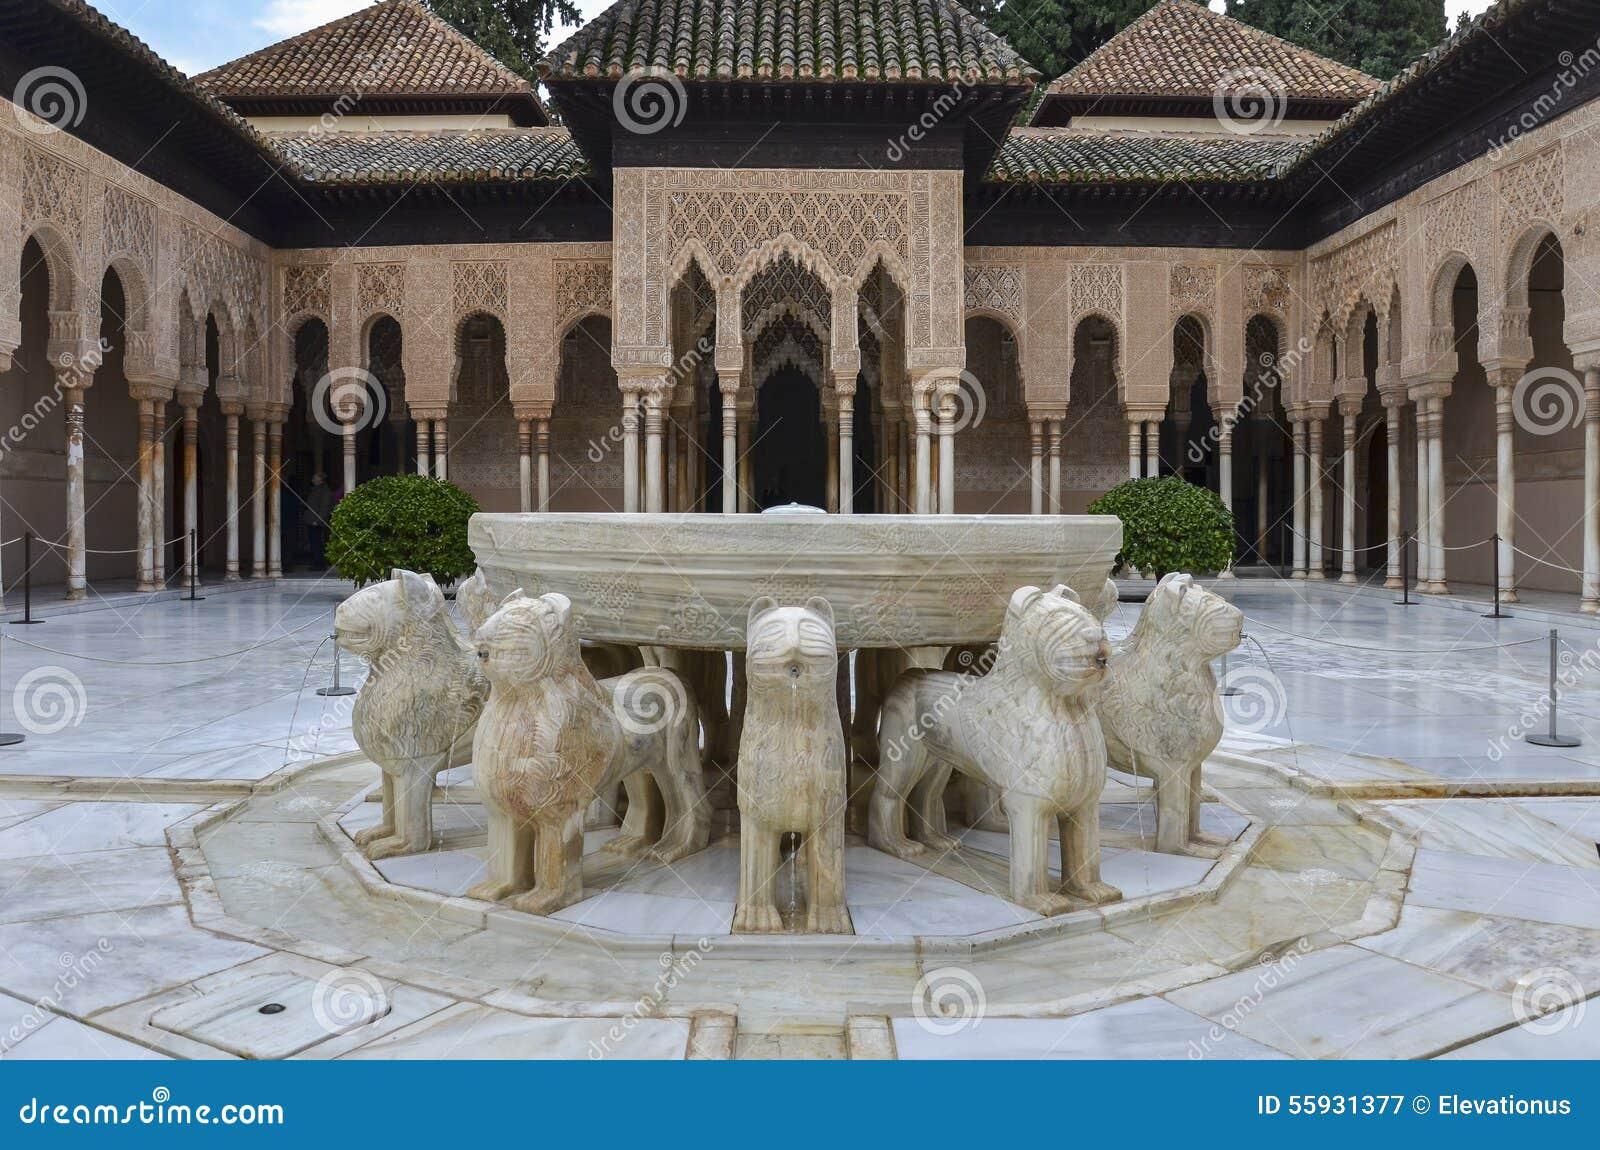 Lions Patio In Alhambra Granada Spain Stock Illustration